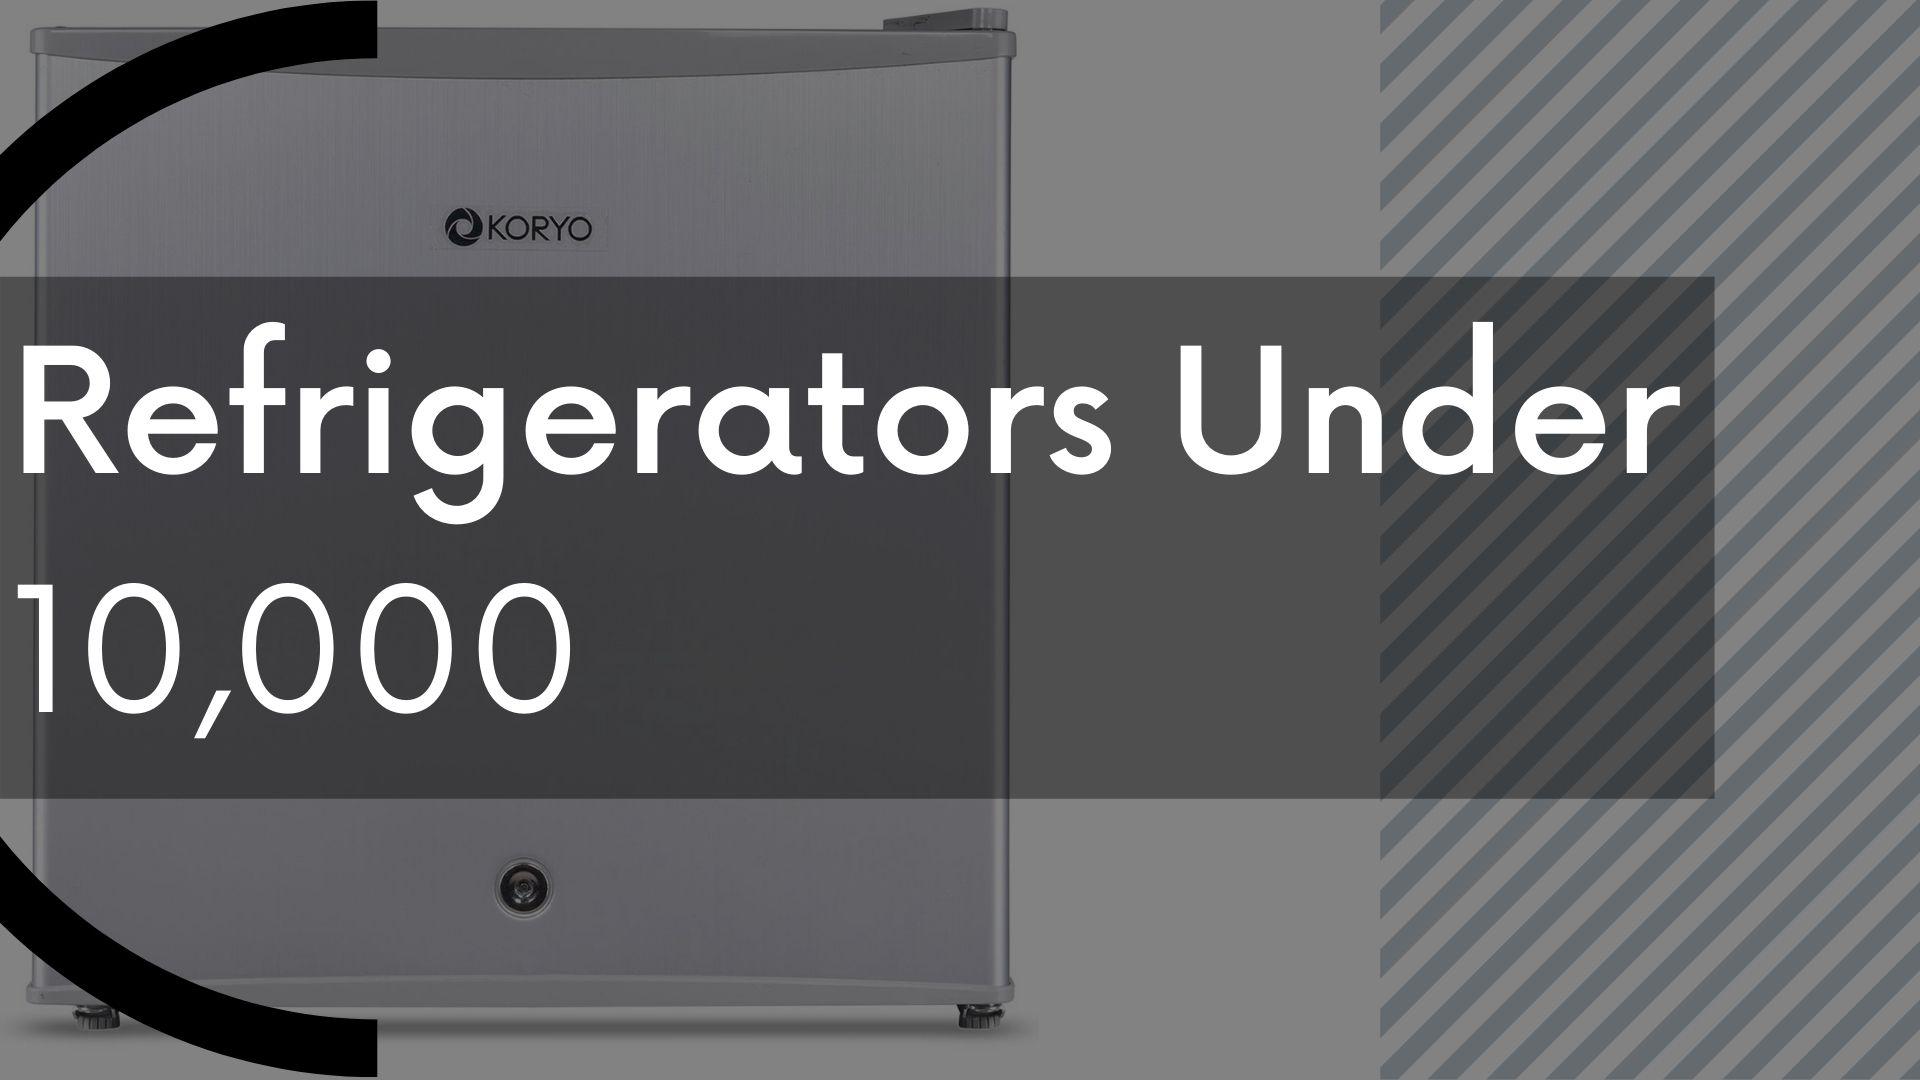 Refrigerators Under 10,000